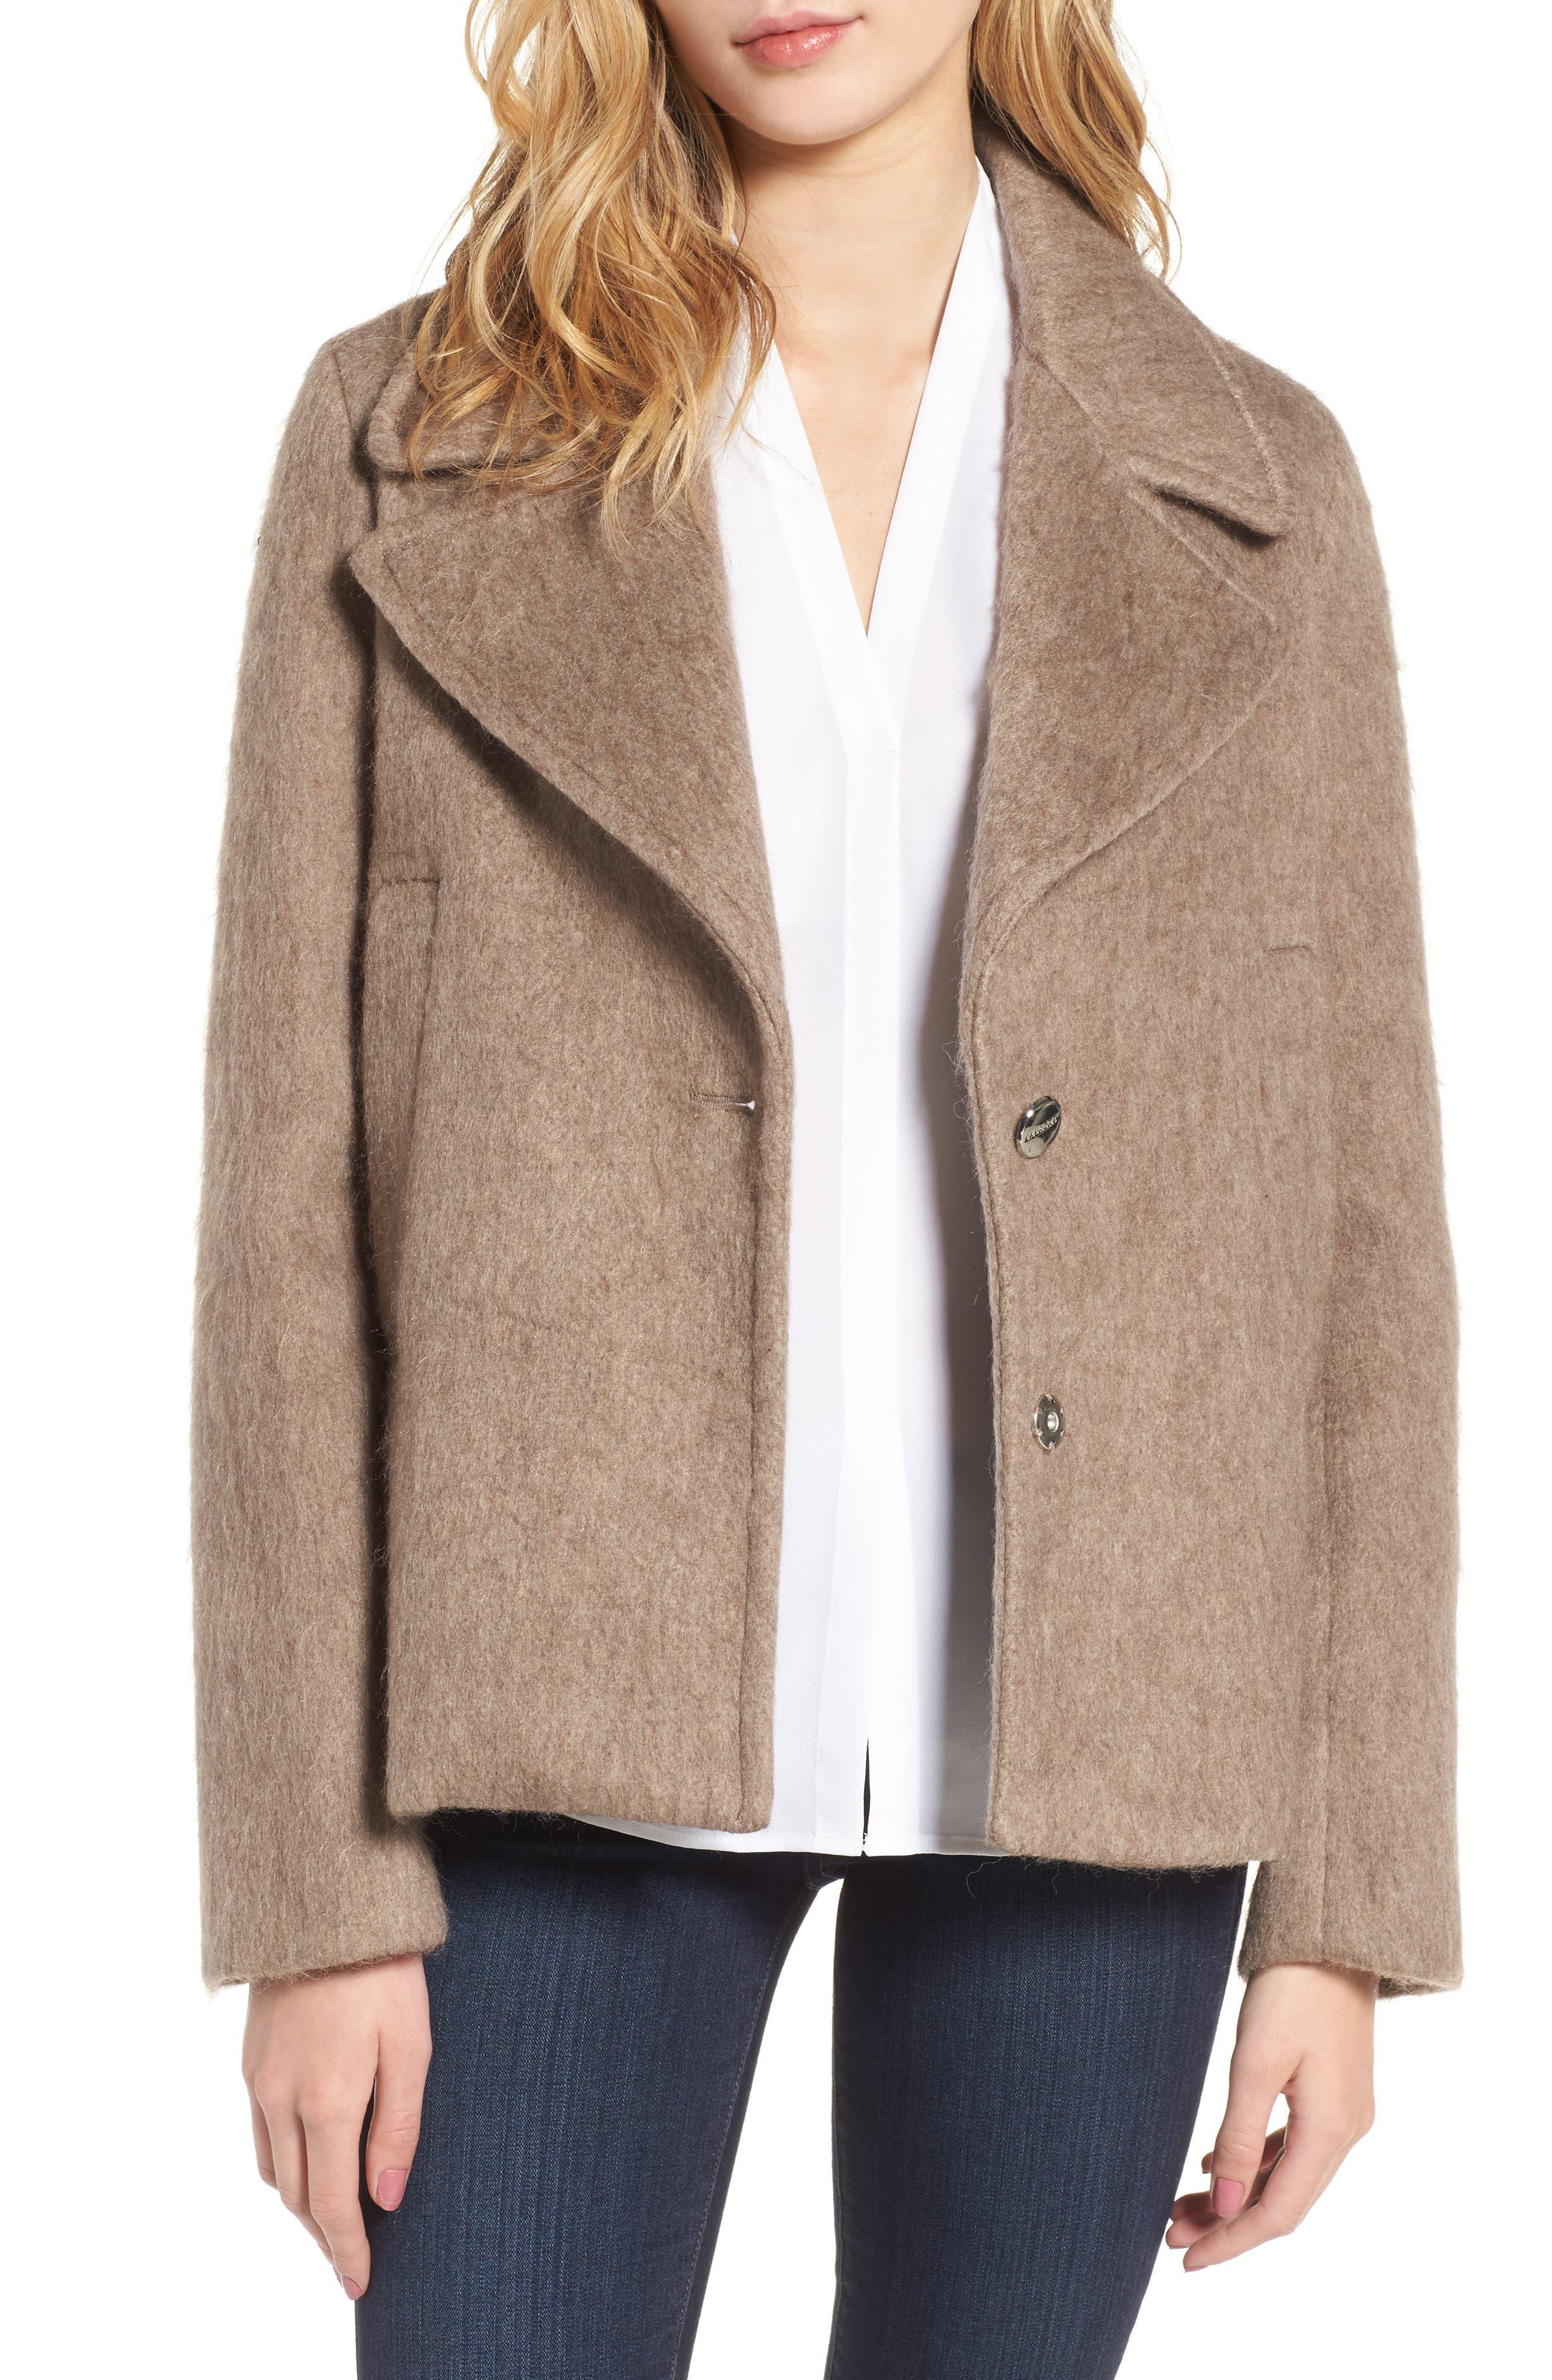 Laundry by Shelli Segal Plaid Swing Coat